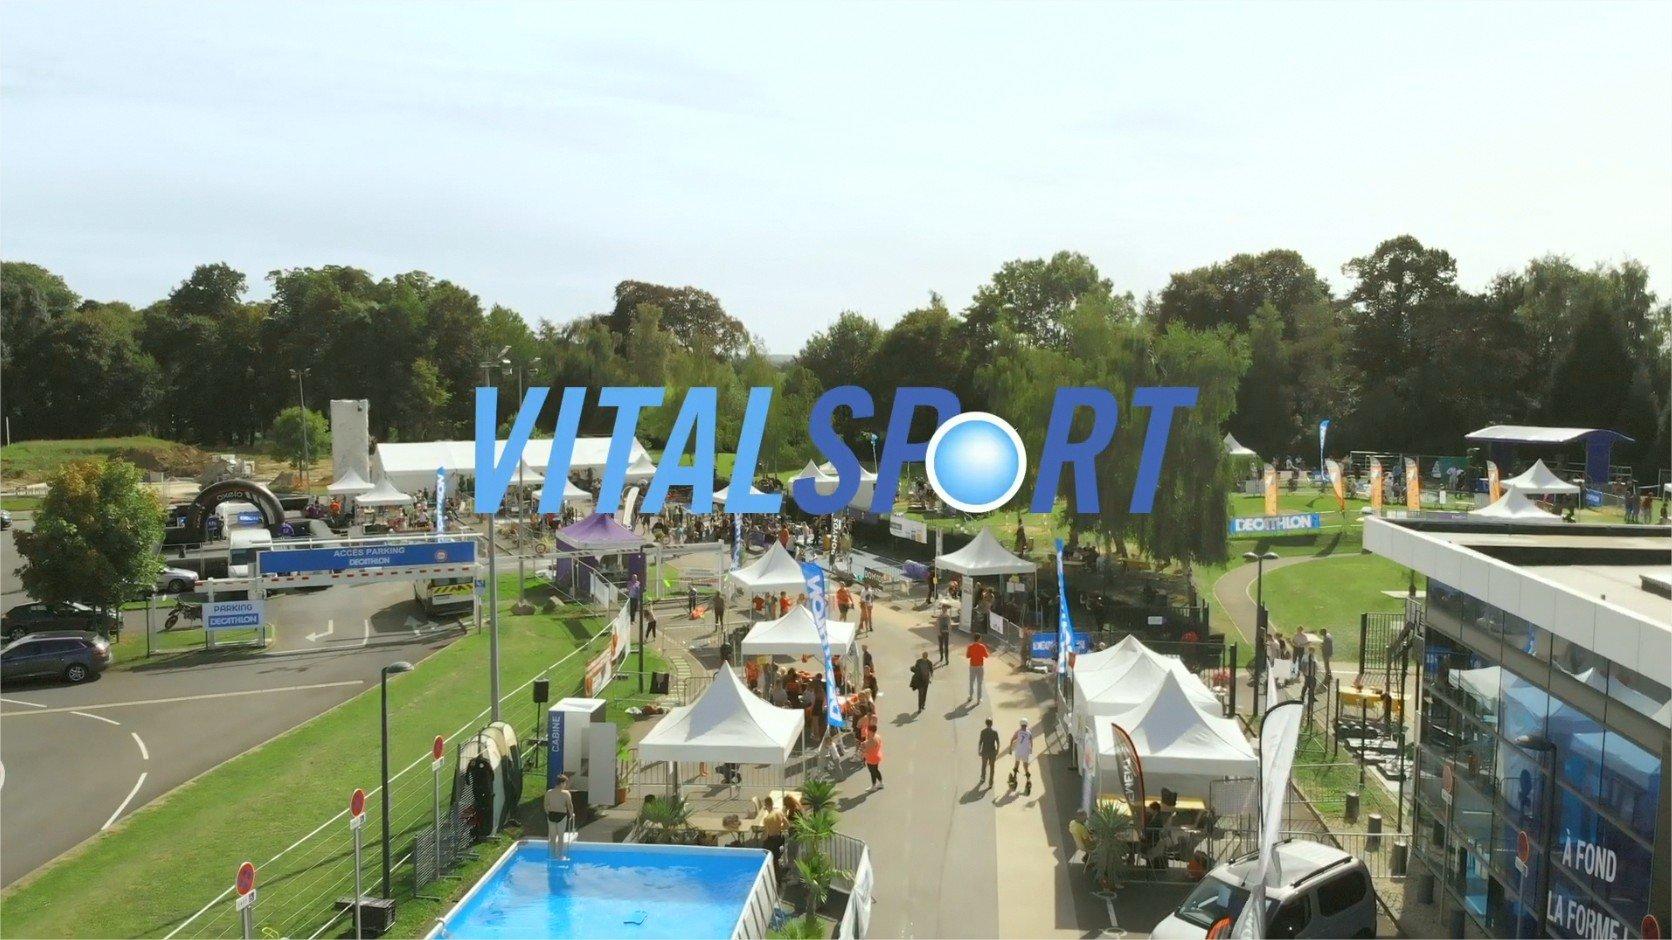 Decathlon Son Evenement Vitalsport Promu Par Rosbeef